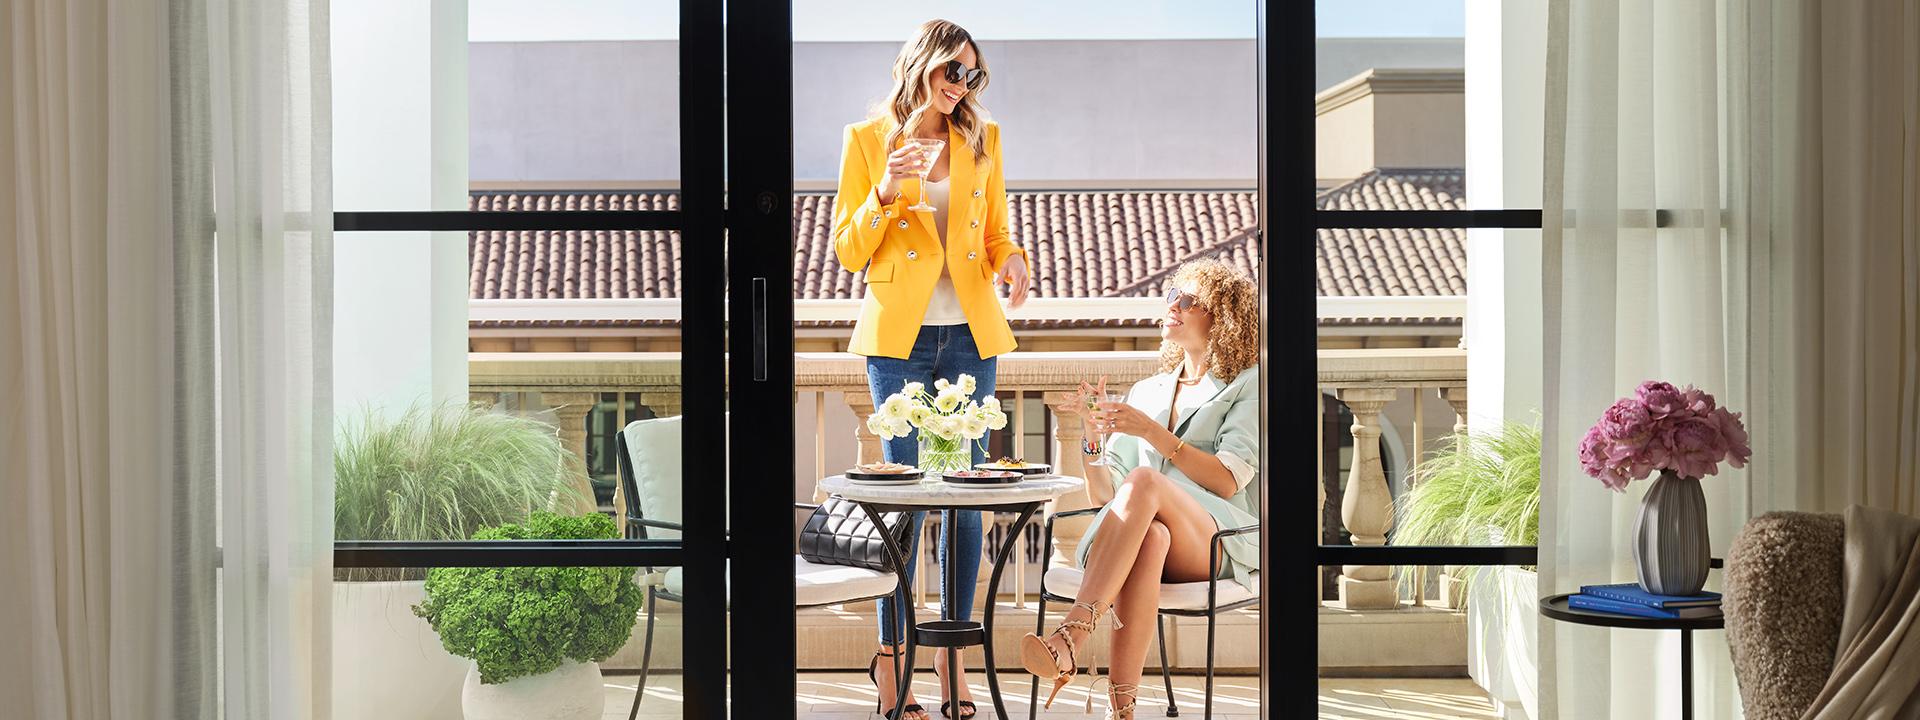 Two women enjoying drinks on the luxury suite balcony